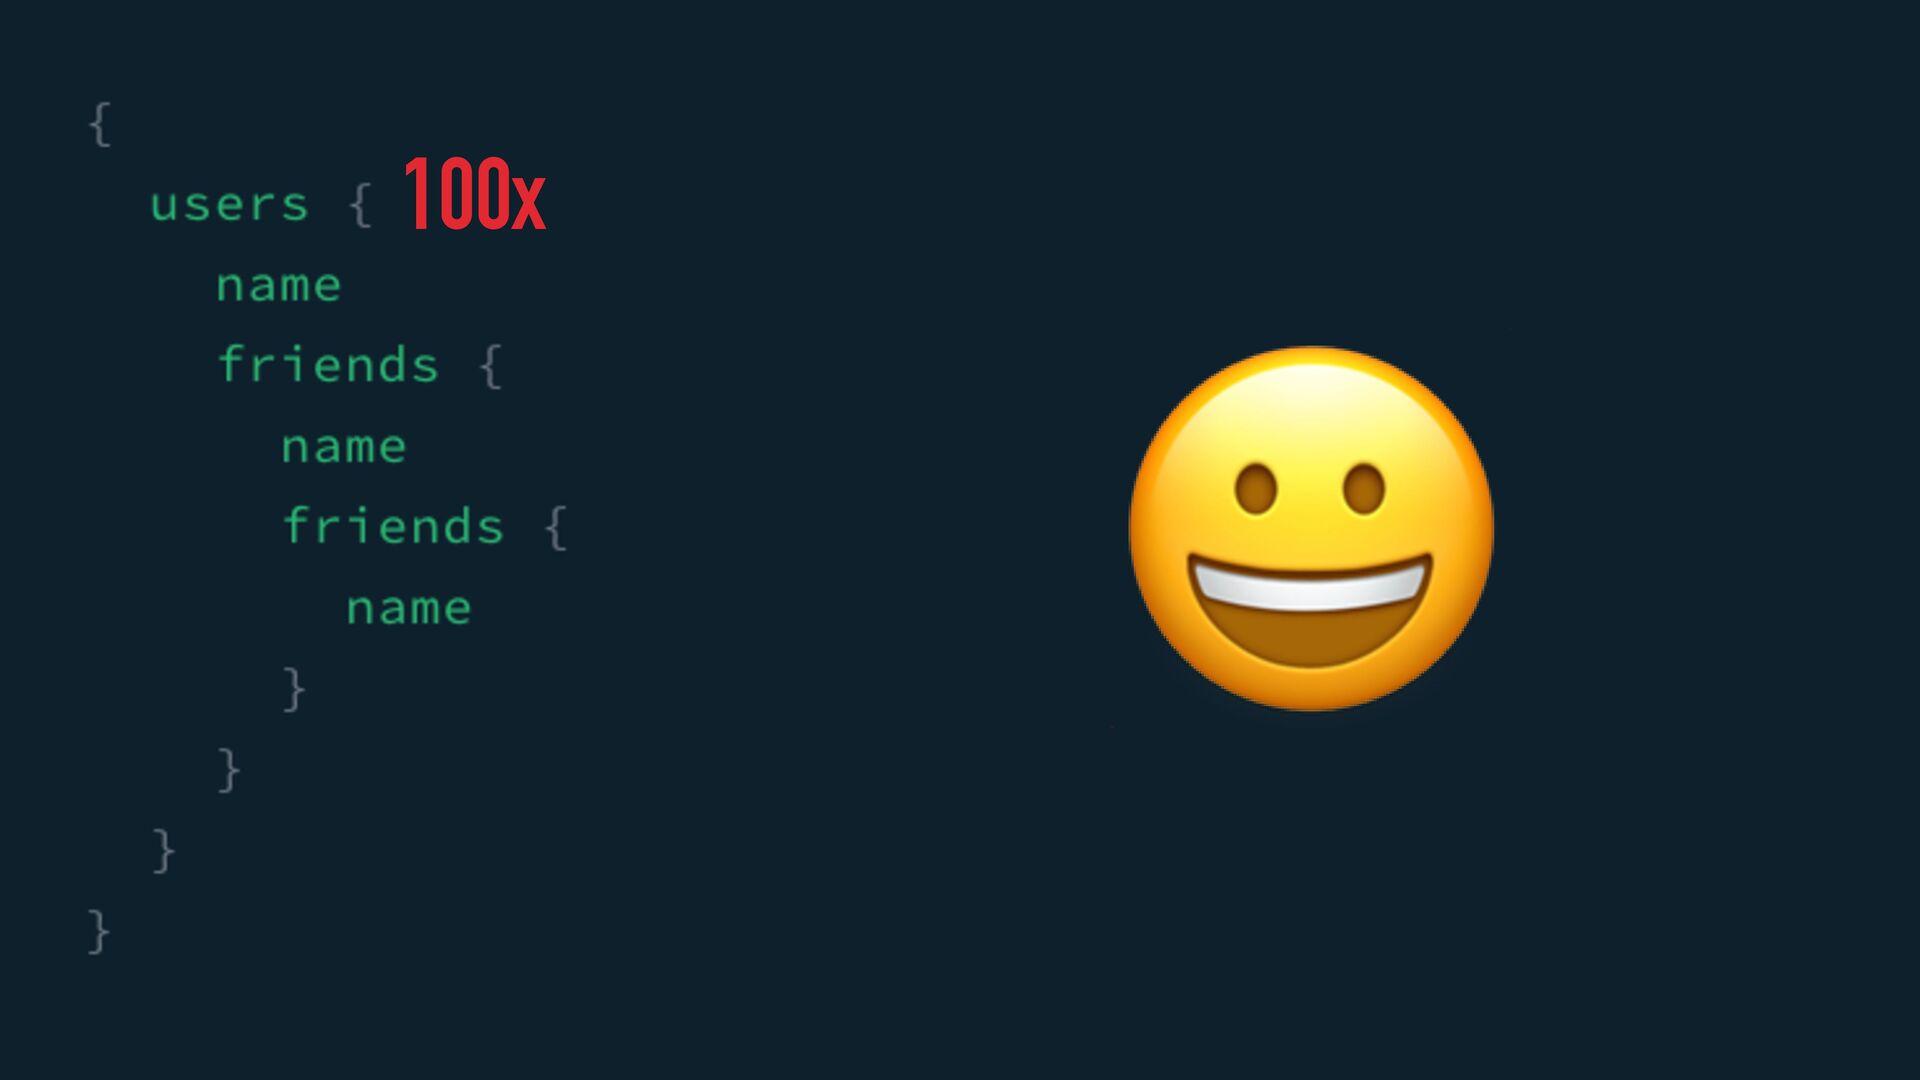 100x 10x 🙂